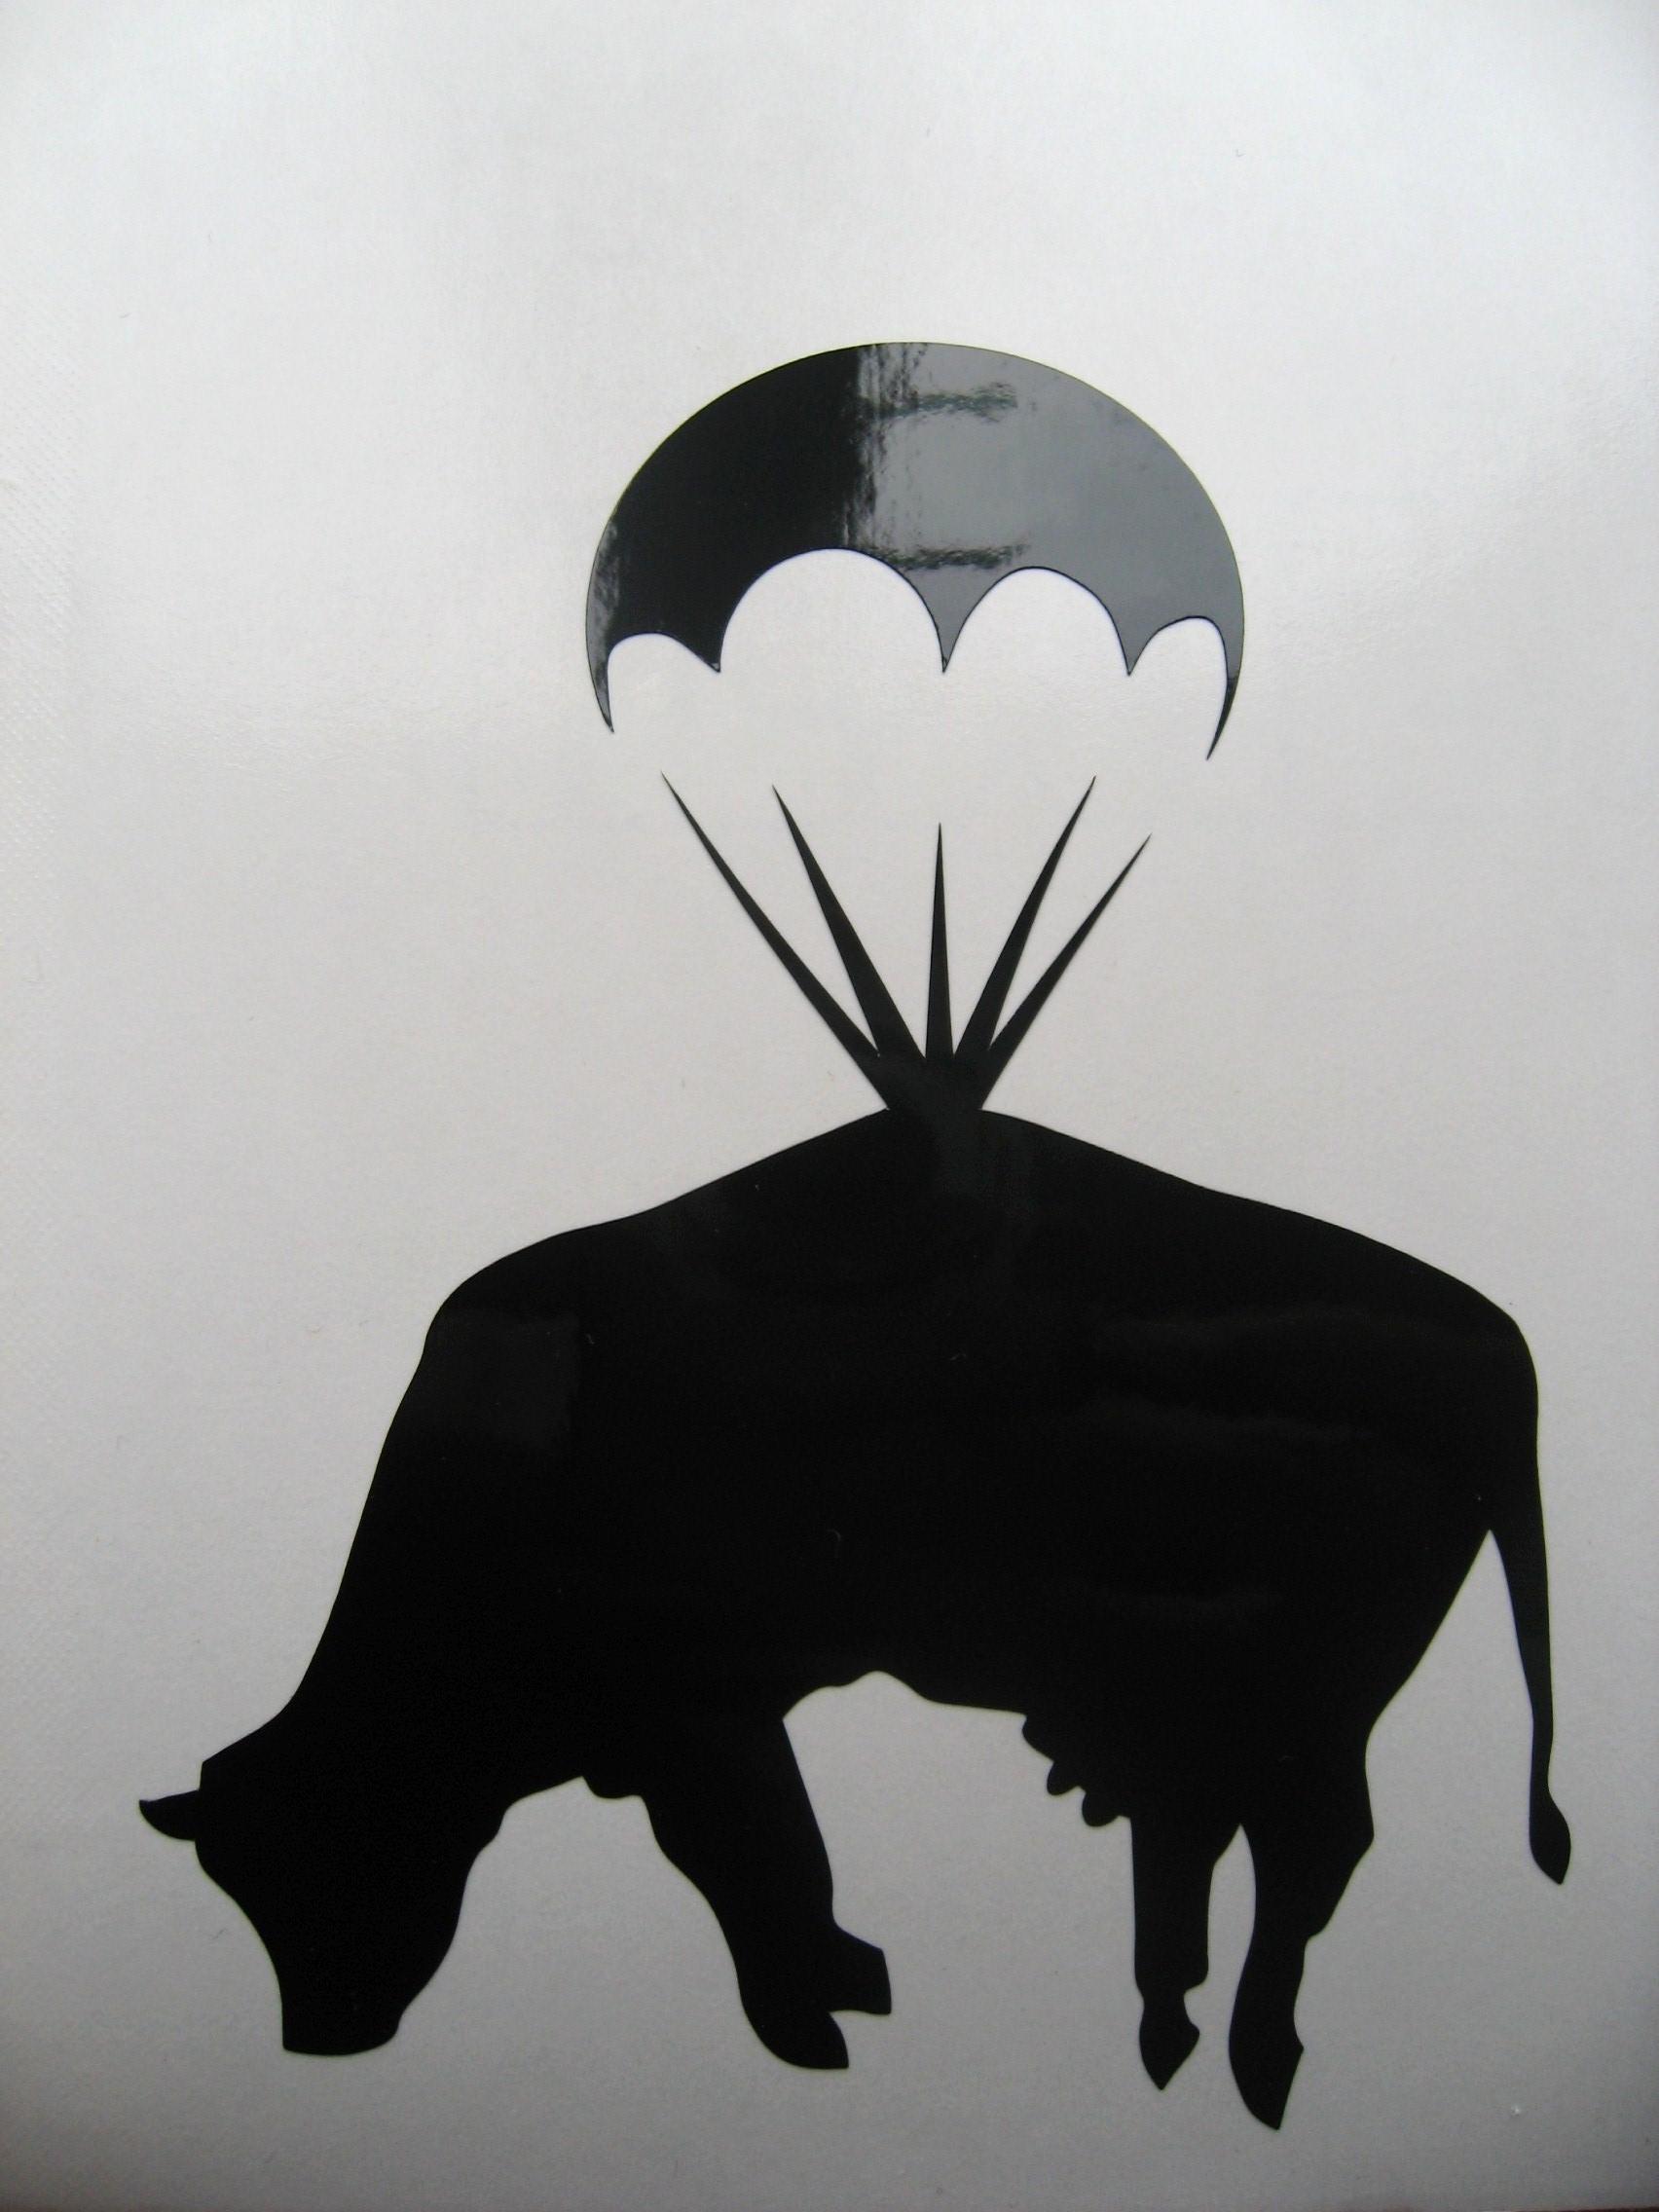 Drawn cattle graffiti #6